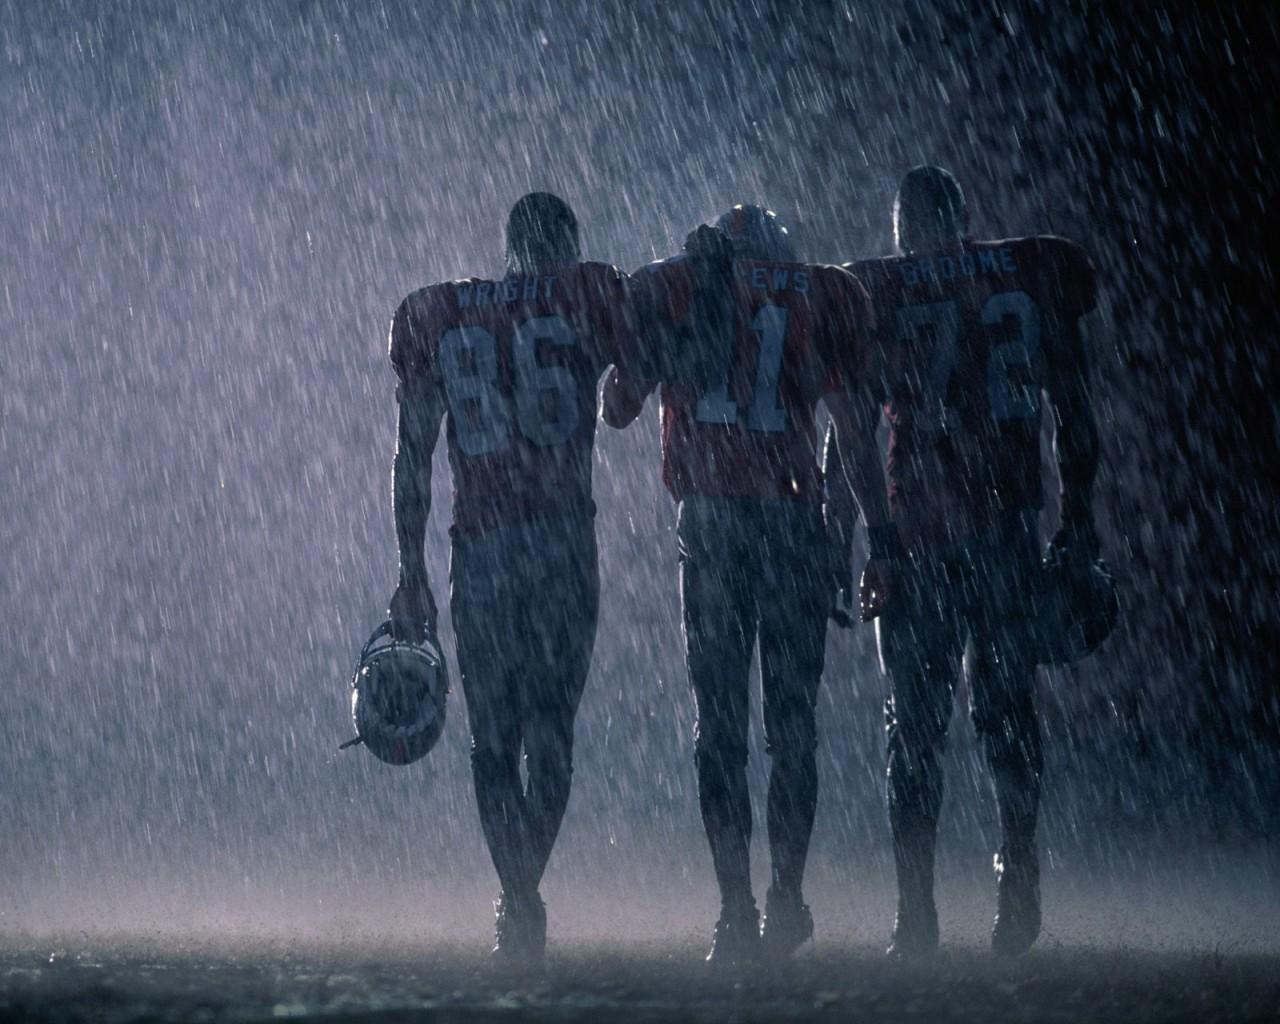 American Football Nfl Team Spirit 1280x1024 STANDARD Image Sports 1280x1024